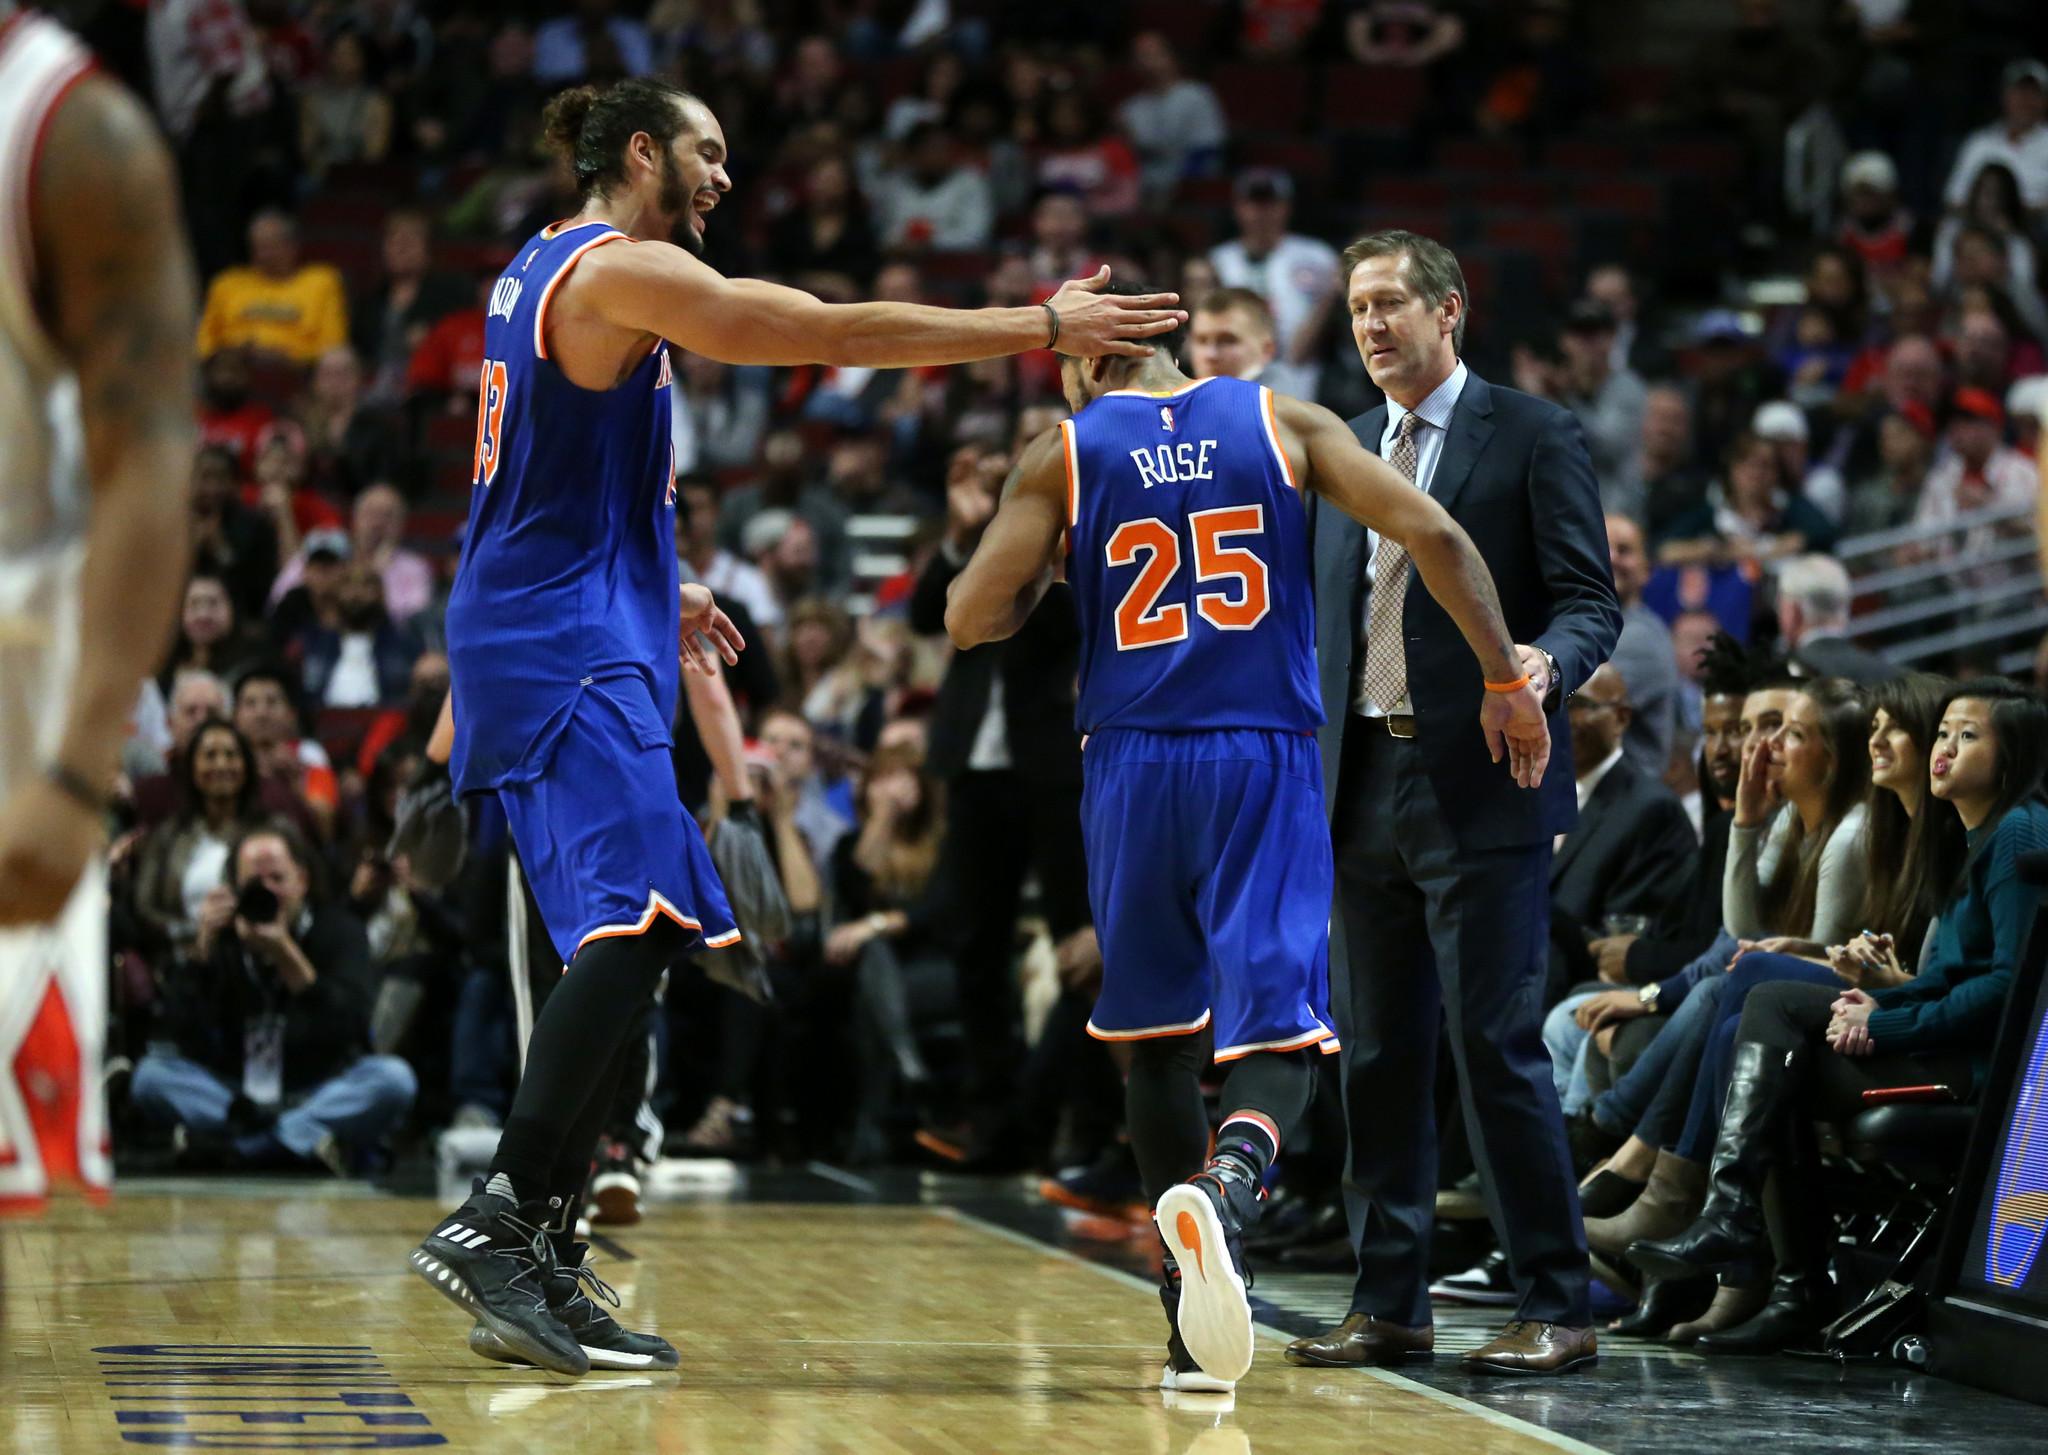 c1beba0edec8 Knicks bash Bulls with lift from Derrick Rose and Joakim Noah - Chicago  Tribune